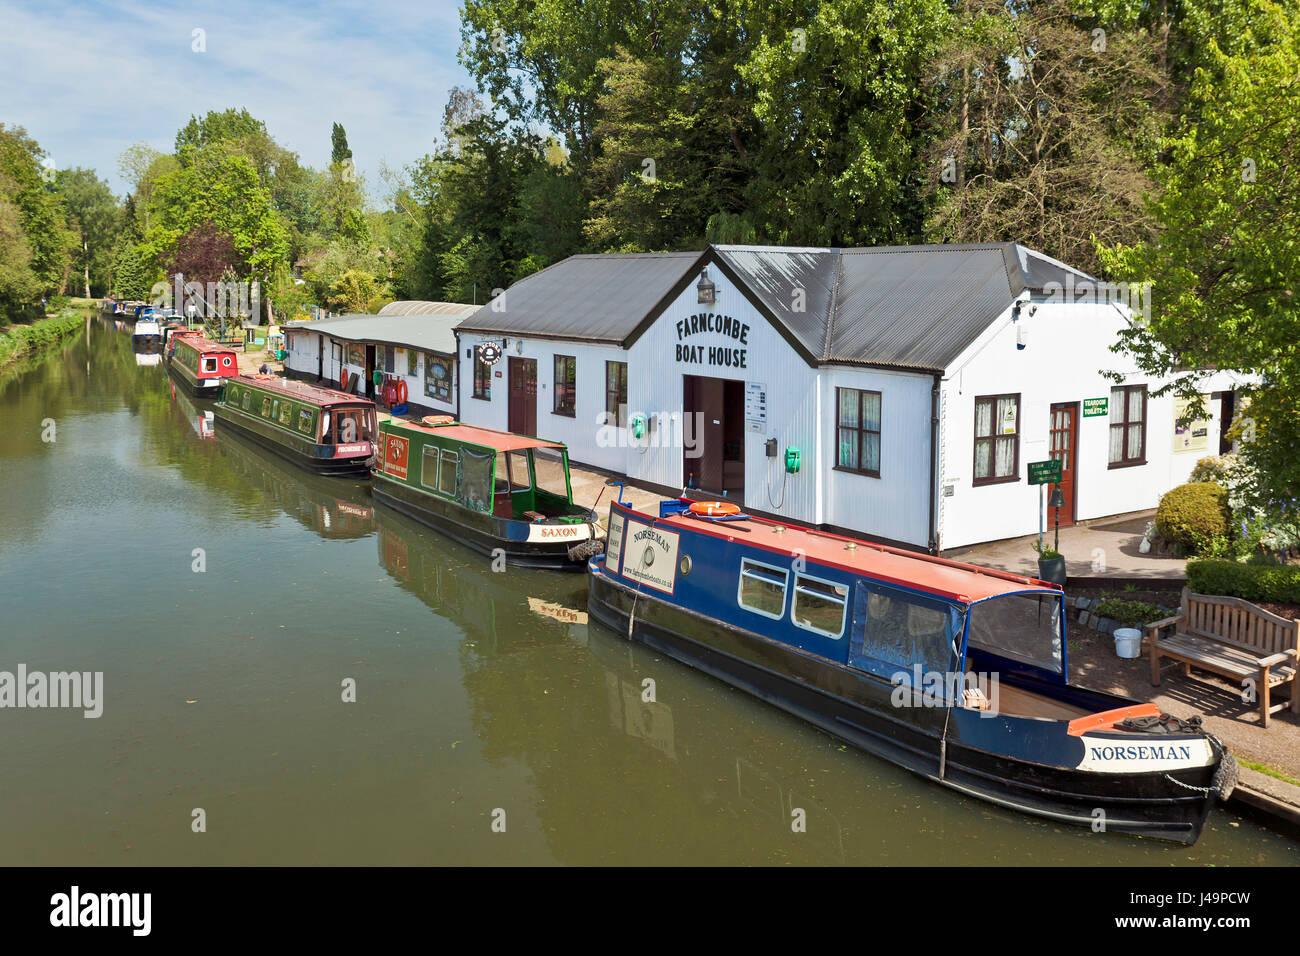 Farncombe boat house,Godalming. - Stock Image